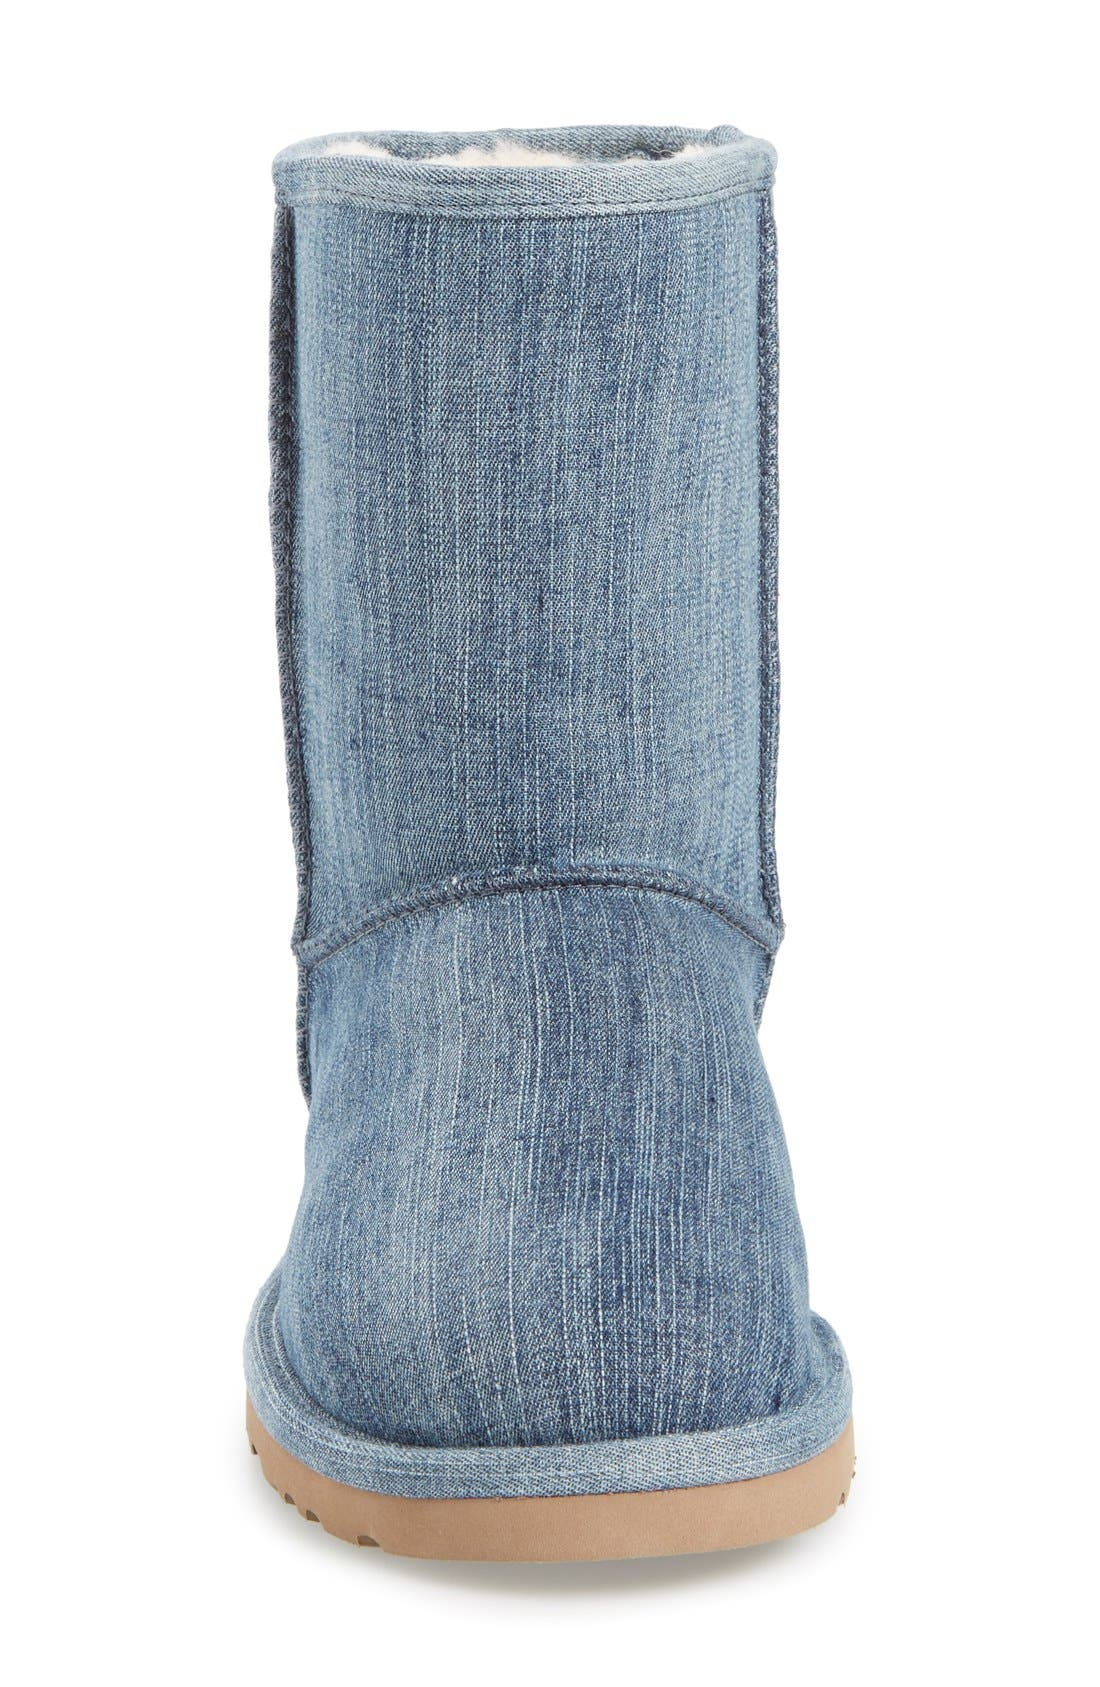 Alternate Image 3  - UGG® 'Classic Short' Denim Boot (Women)